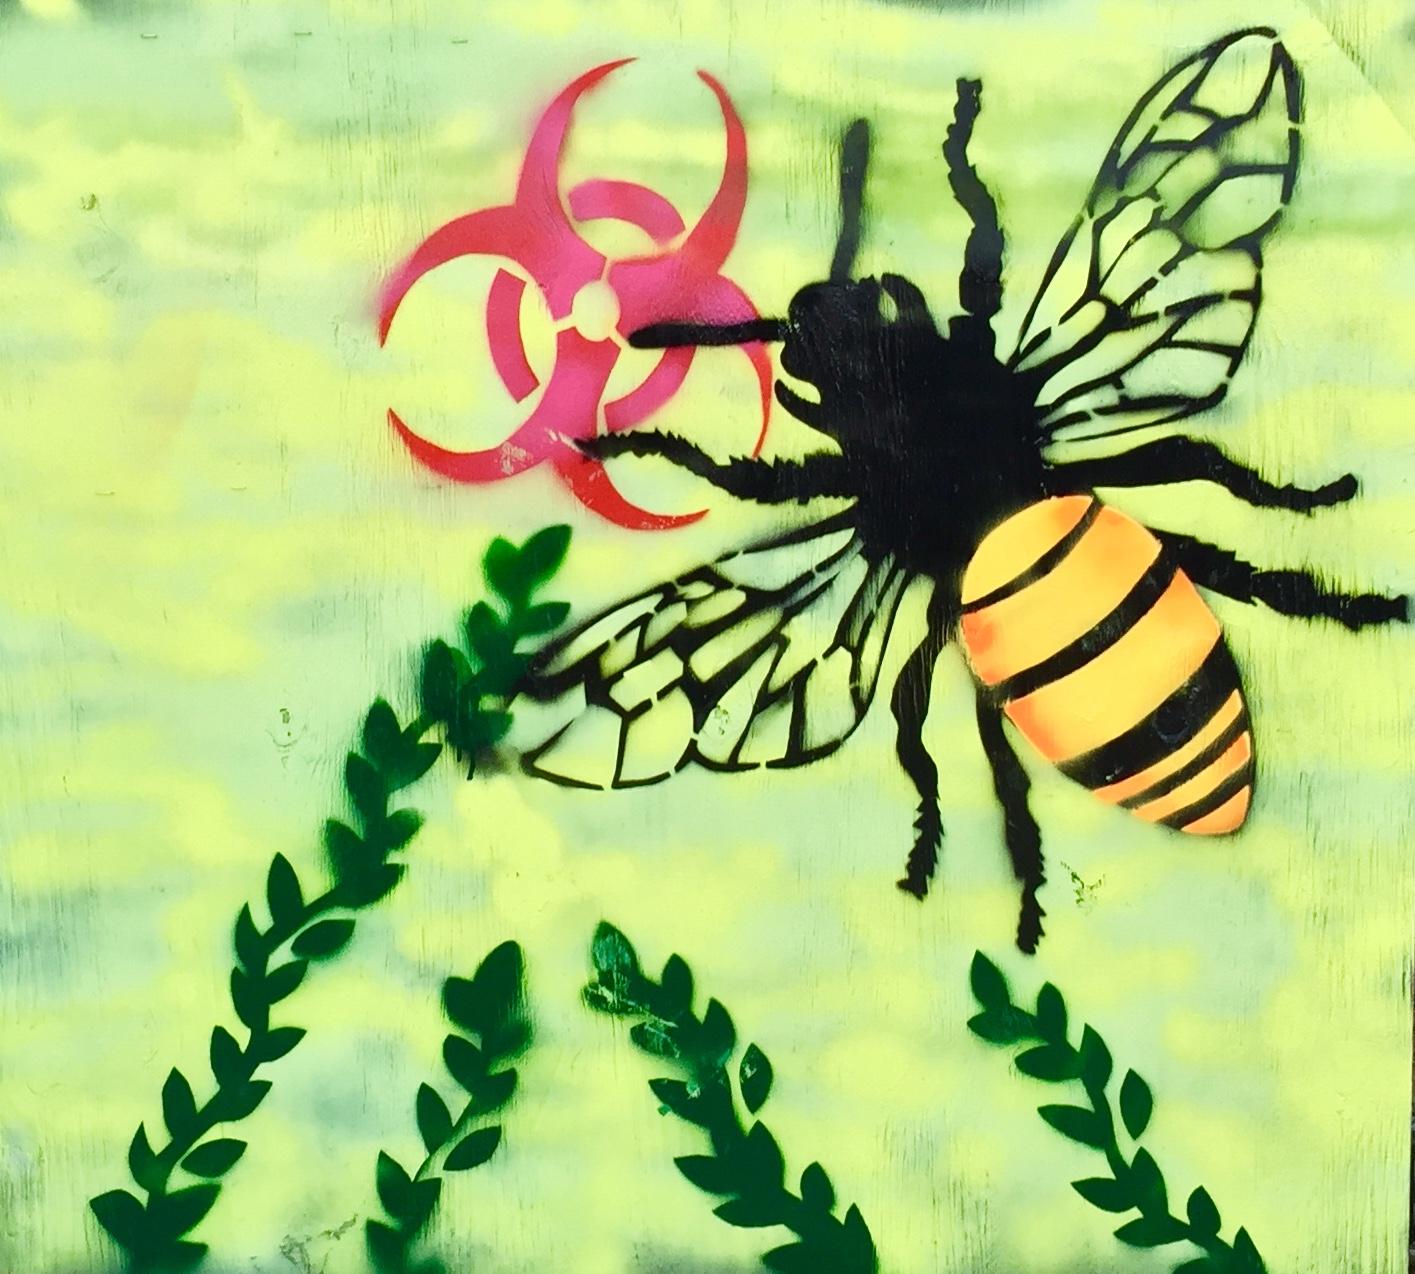 Monsanto, Sprayed Acrylic Stencil, 2015